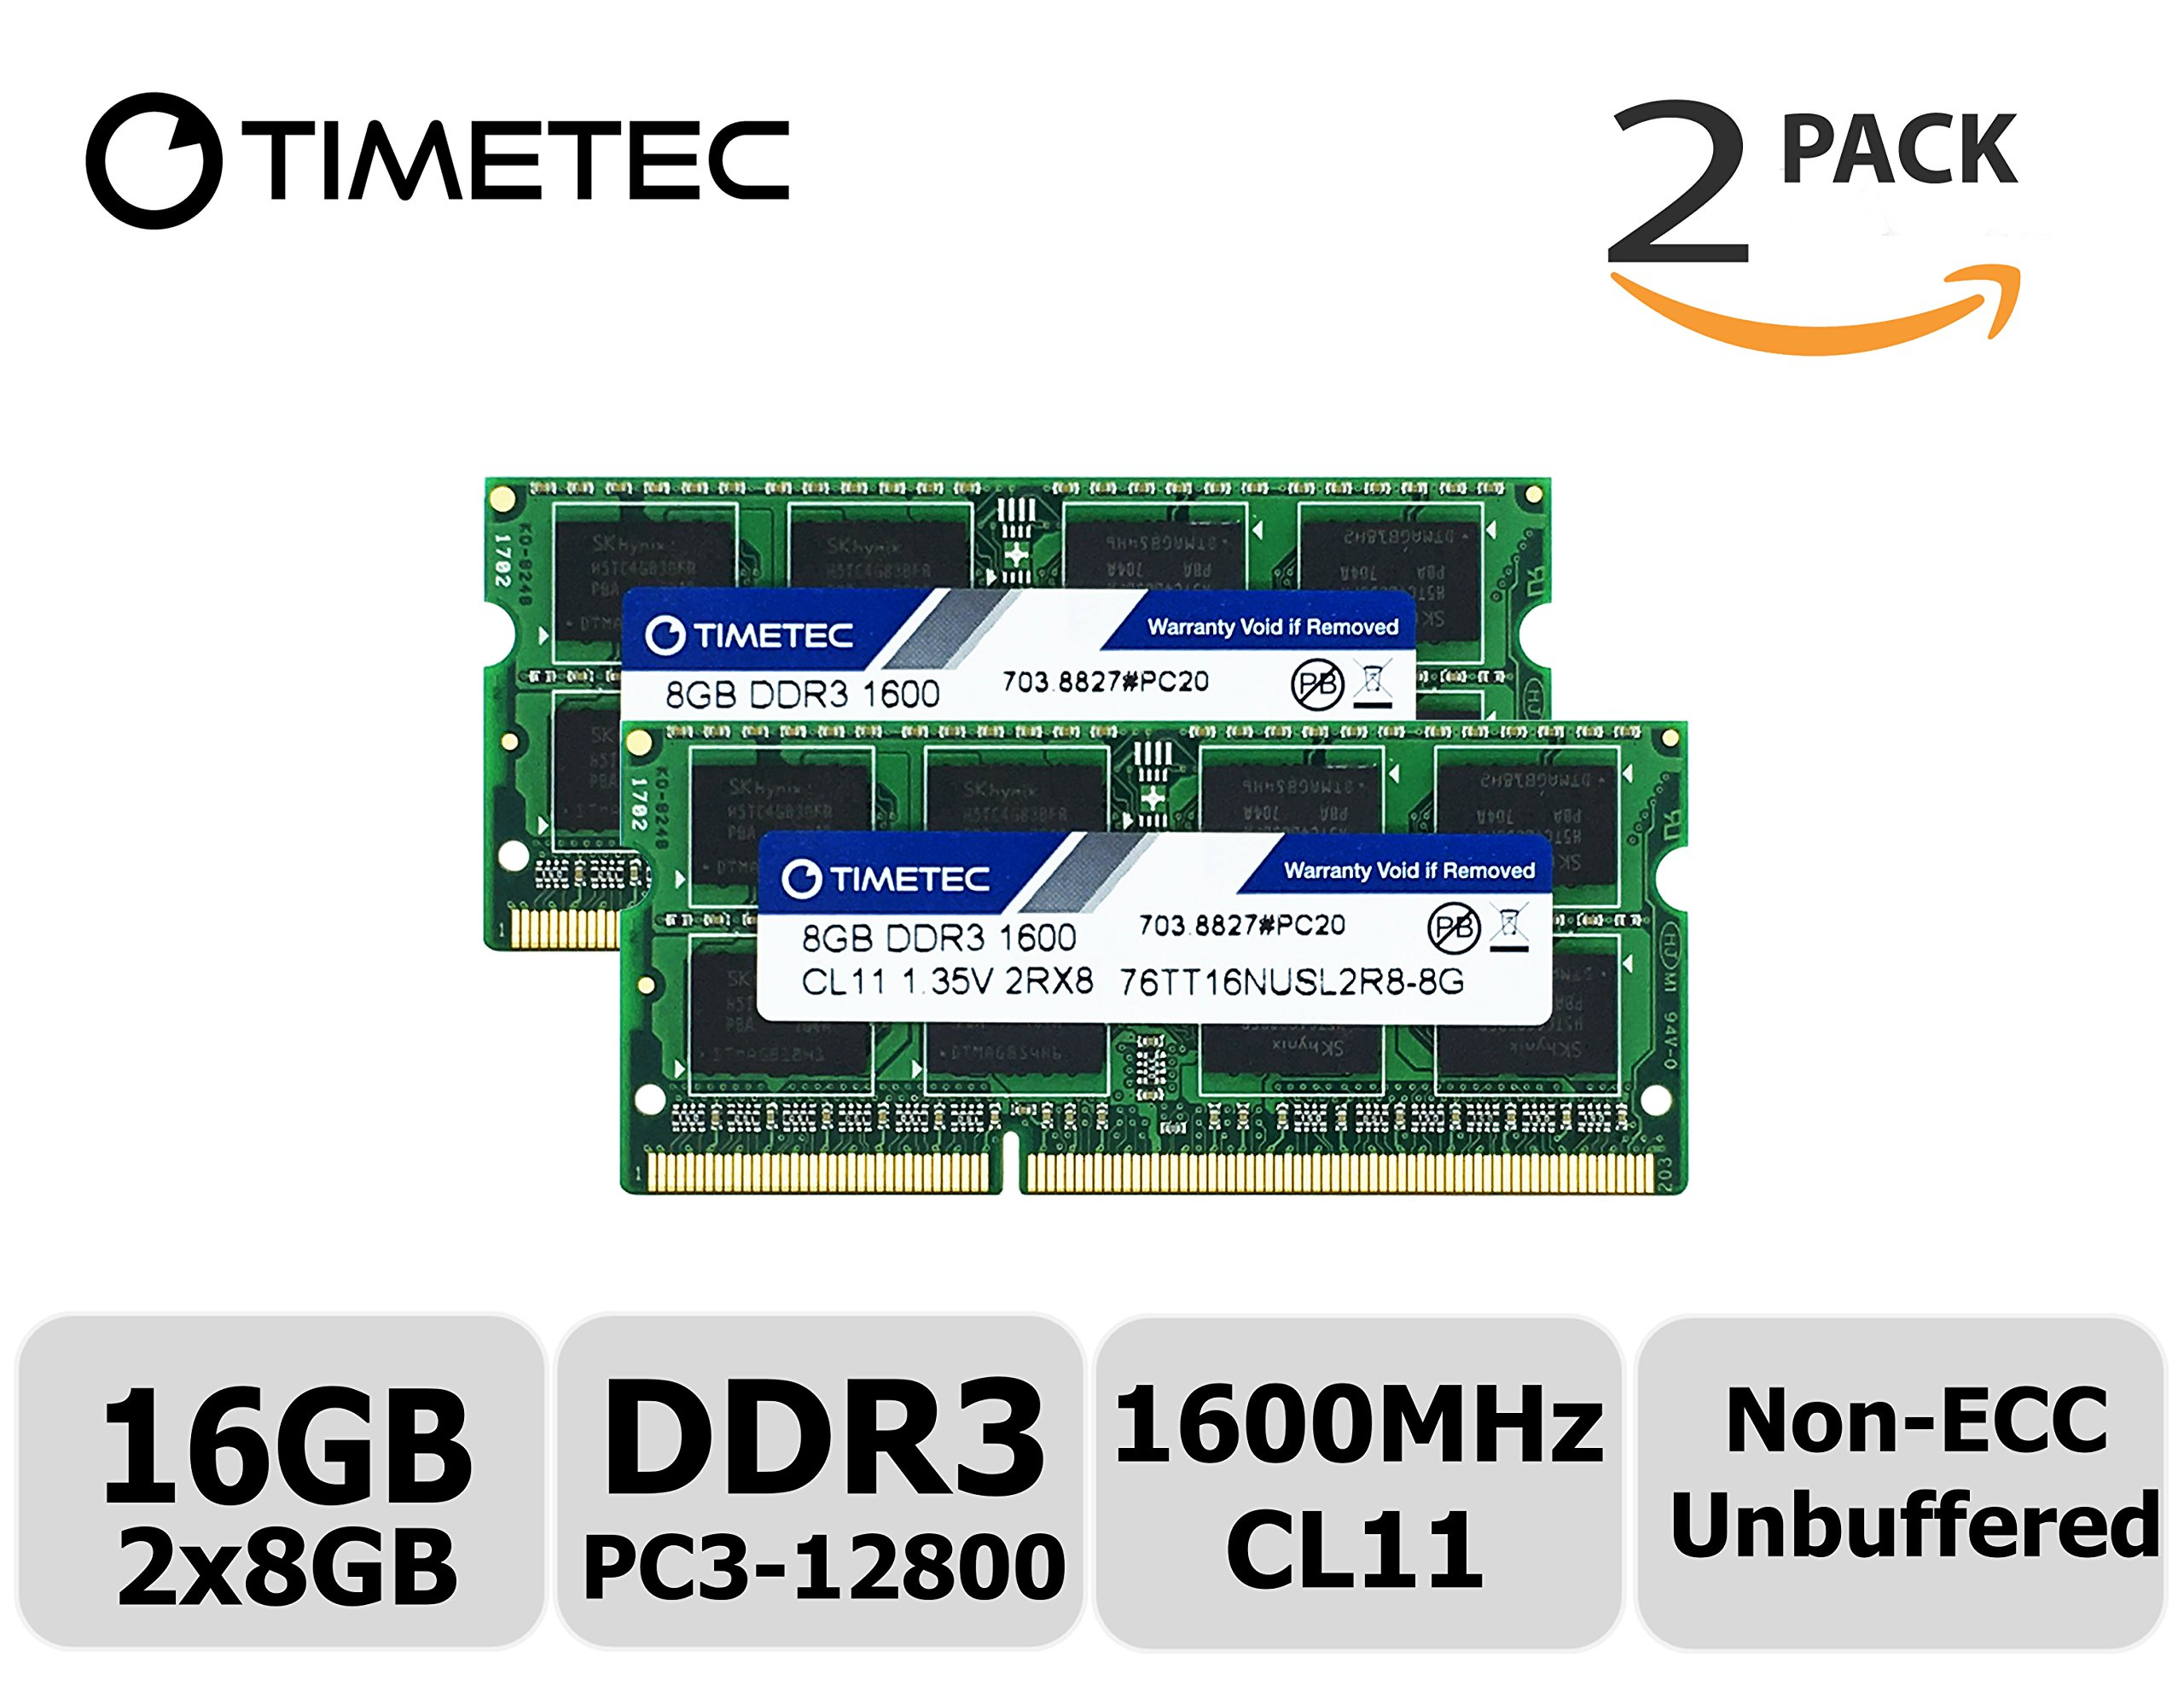 Hynix 16GB 2x8GB PC3L-14900 DDR3-1866Mhz 204PIN Unbuffered SoDIMM Laptop Memory